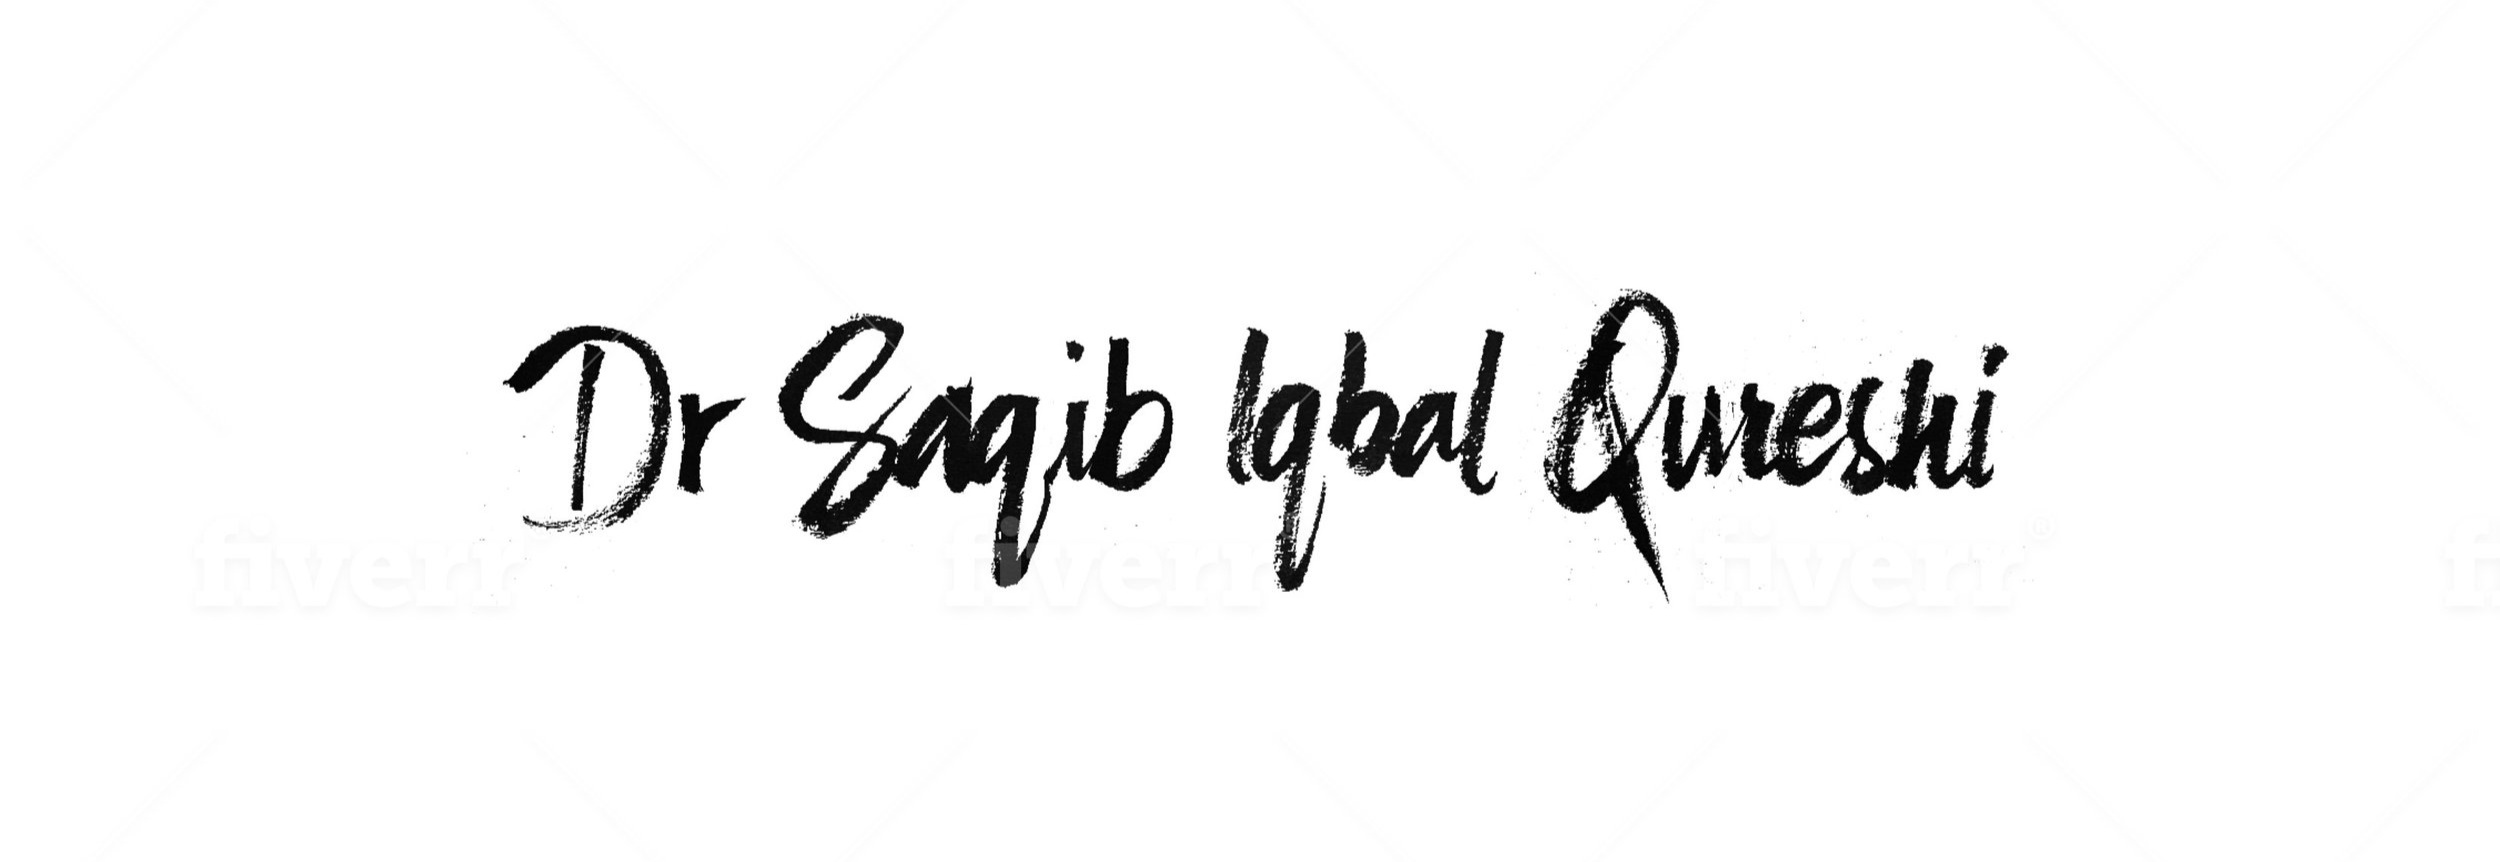 Dr+Saqib+black+and+white.jpg